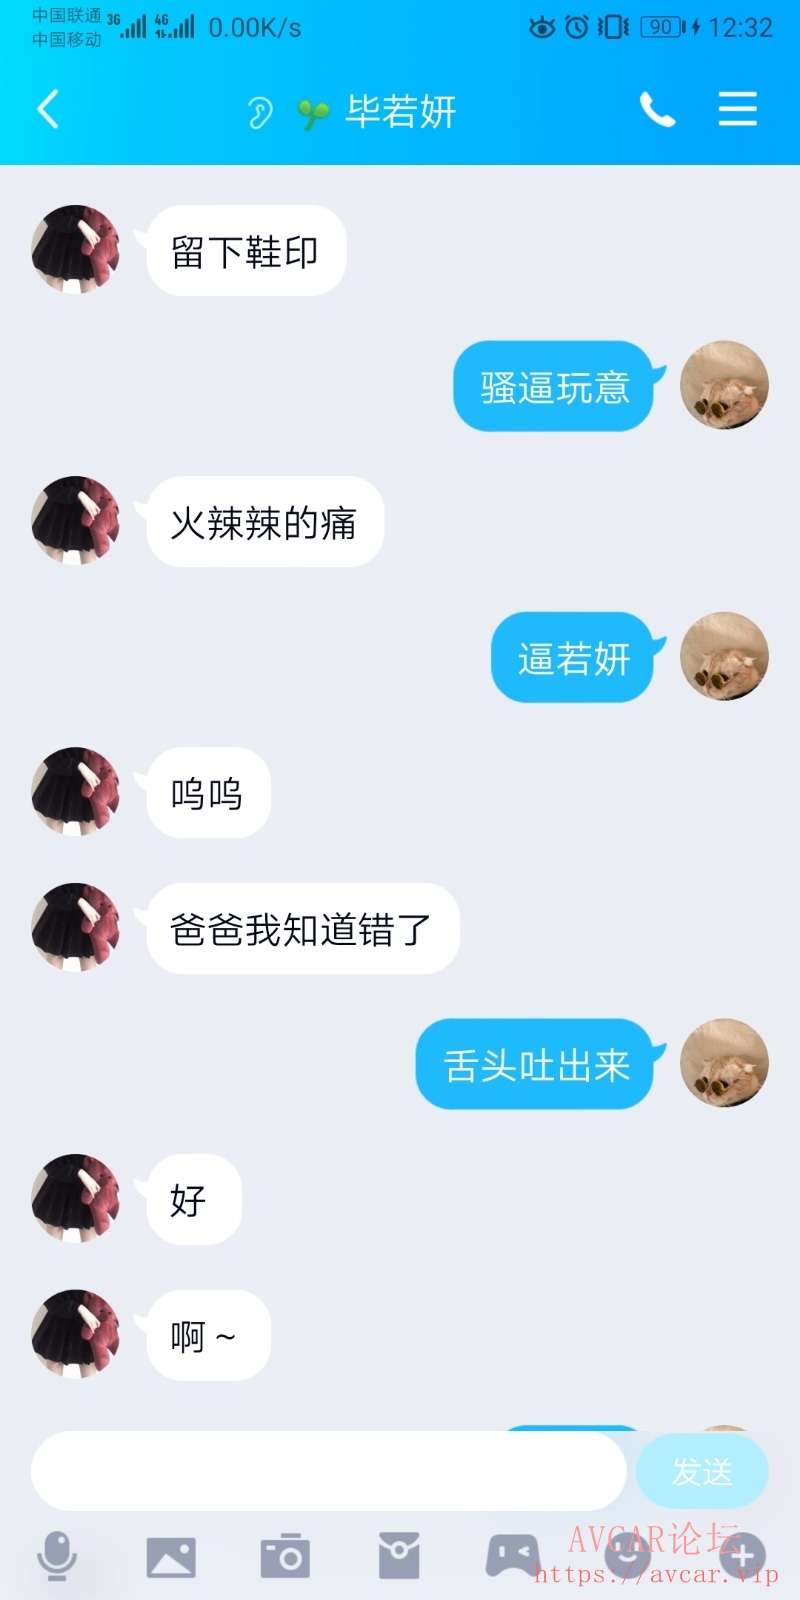 Screenshot_20210720_123200_com.tencent.mobileqq.jpg